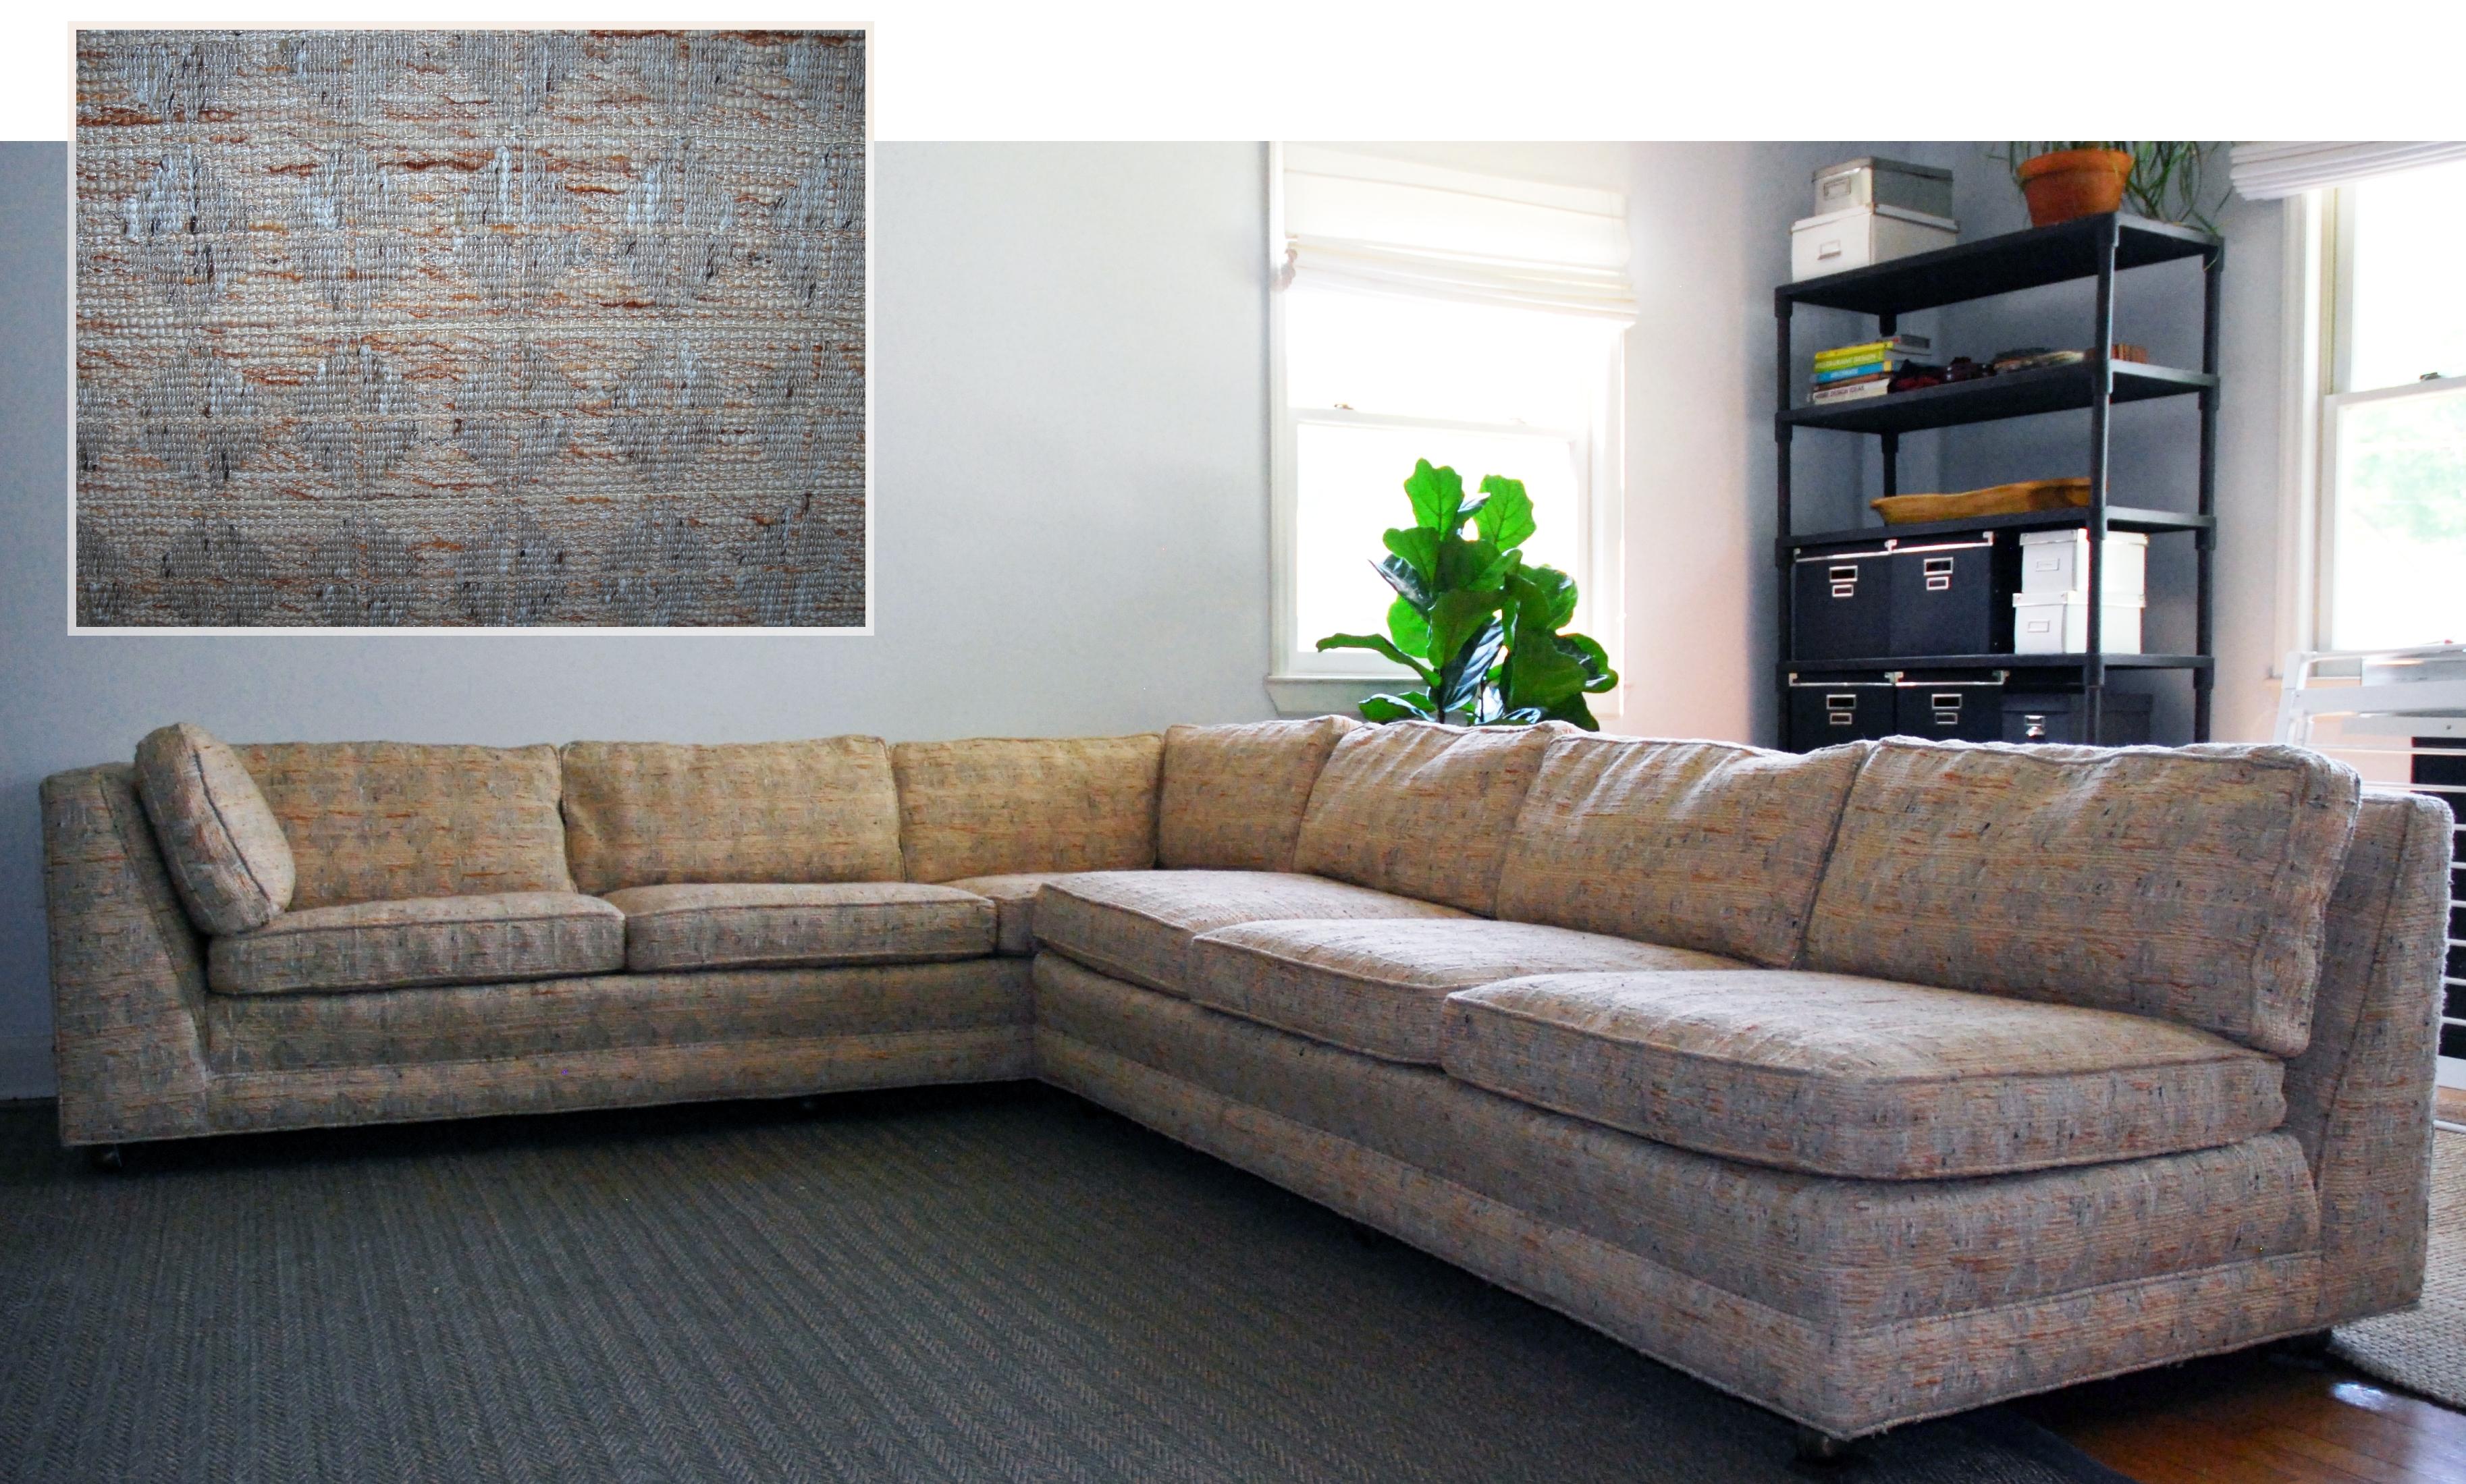 High Quality Sectional Sofas – Hotelsbacau Throughout Quality Sectional Sofas (View 8 of 10)